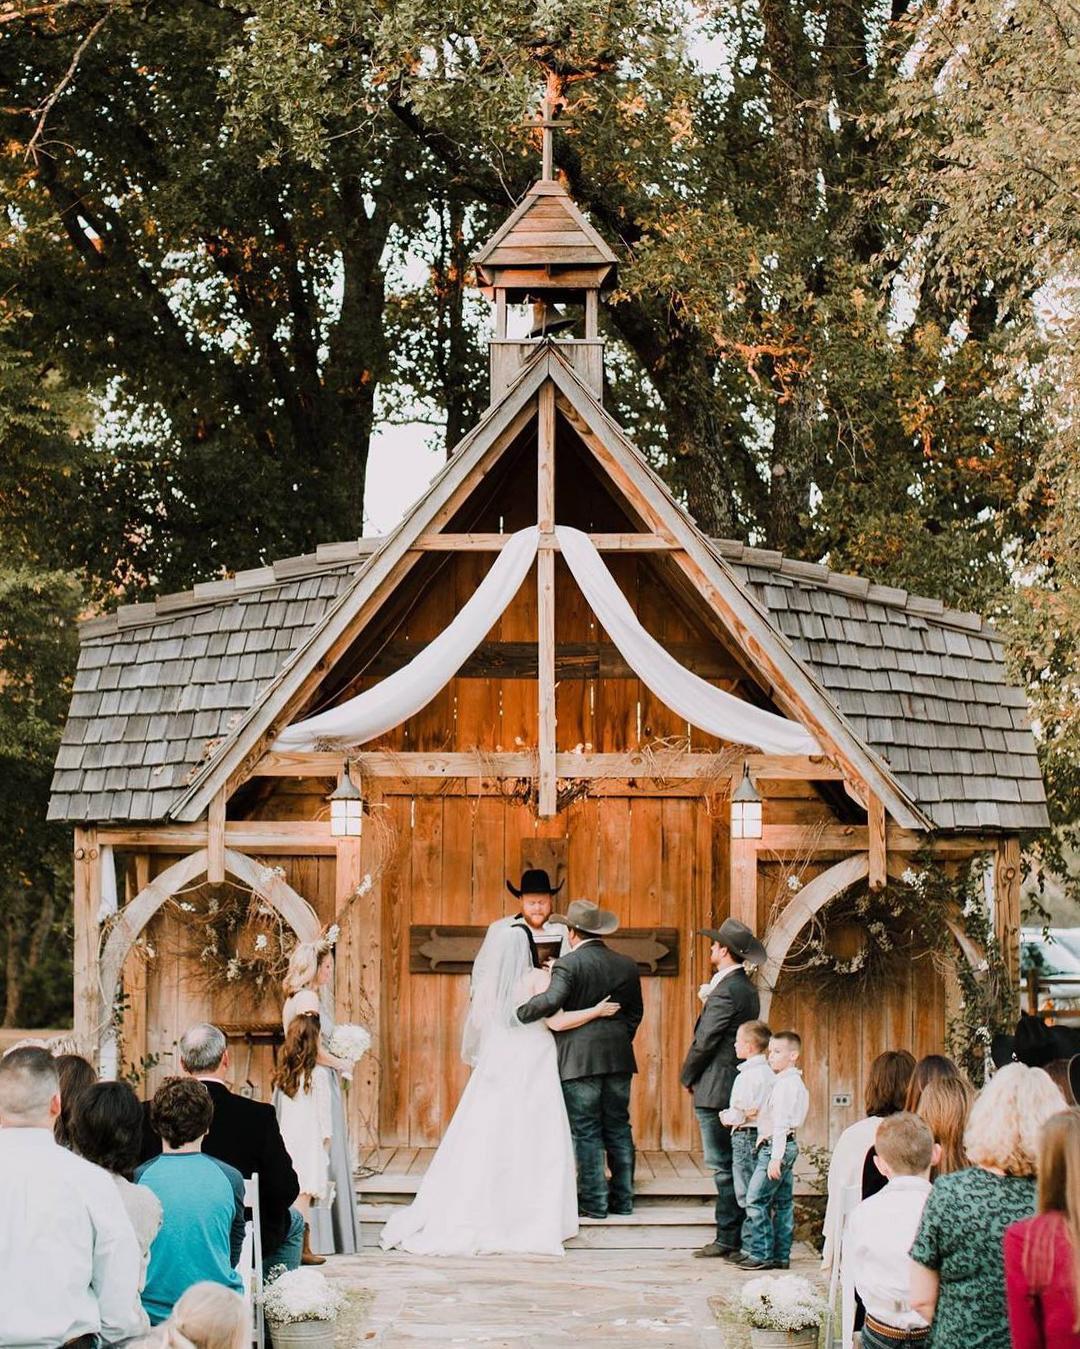 Wedding Venues In East Texas: 90 Beautiful Barn Venues Across The USA